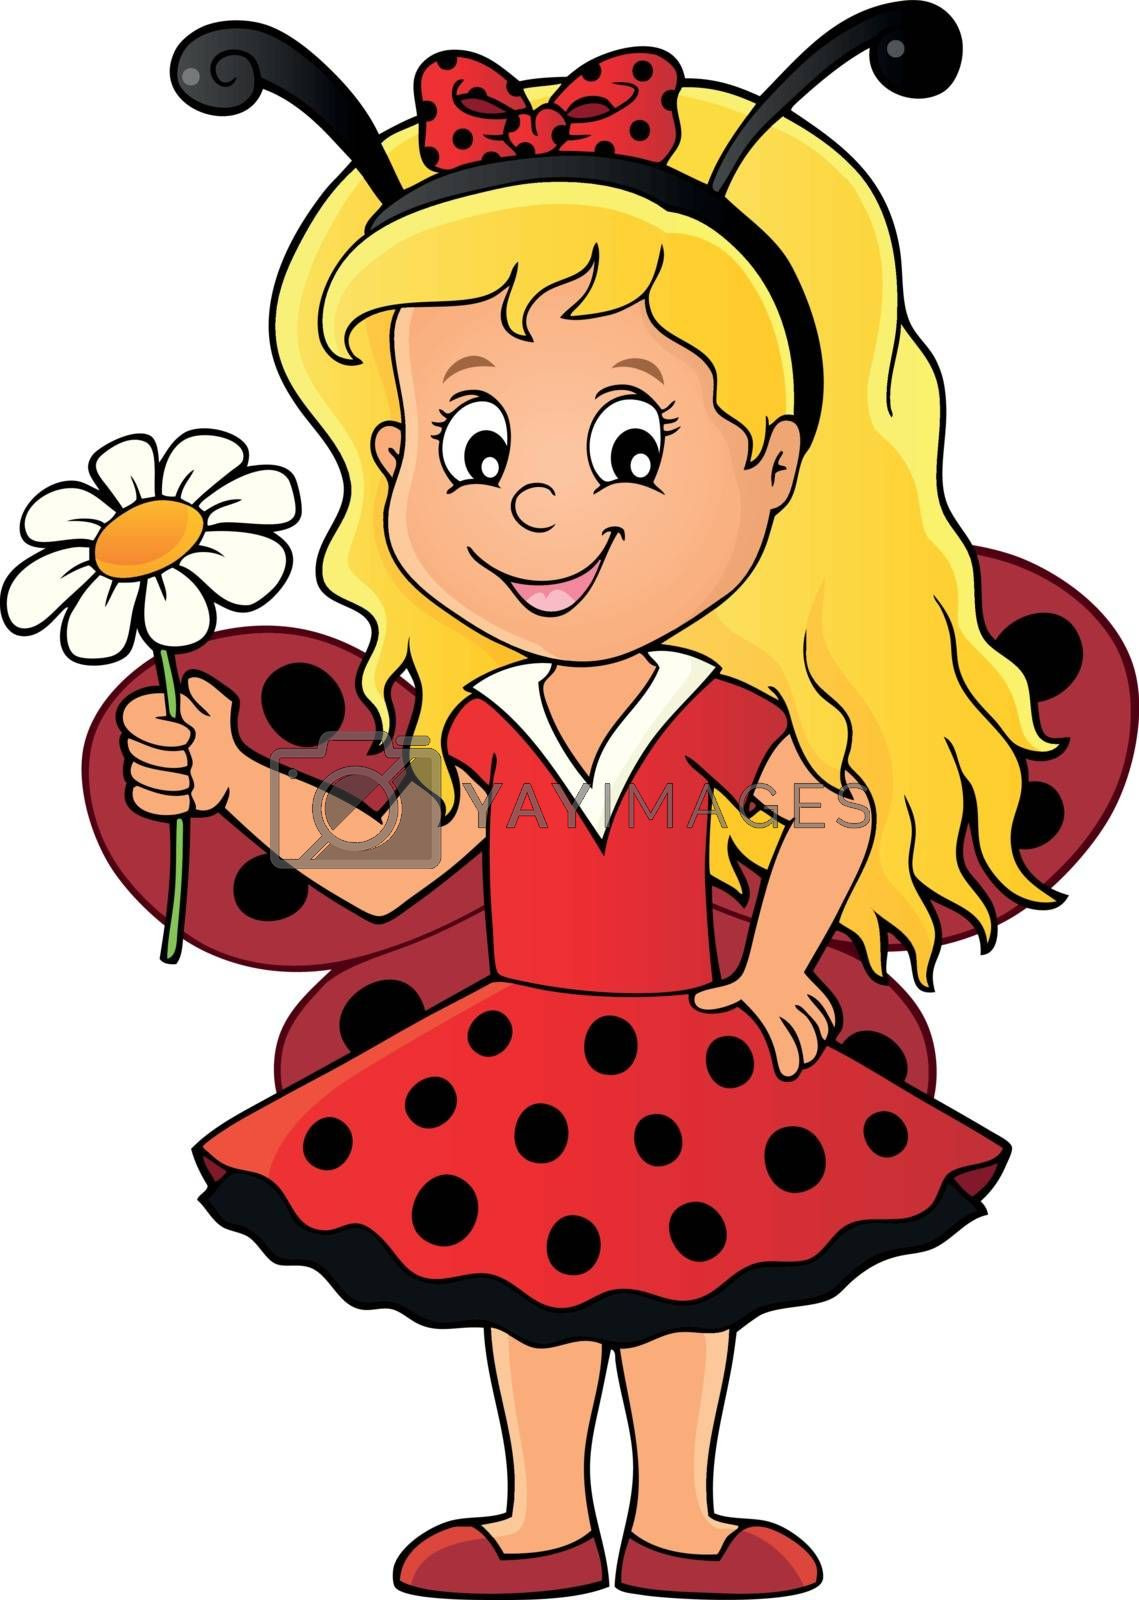 Ladybug girl theme image 1 - eps10 vector illustration.